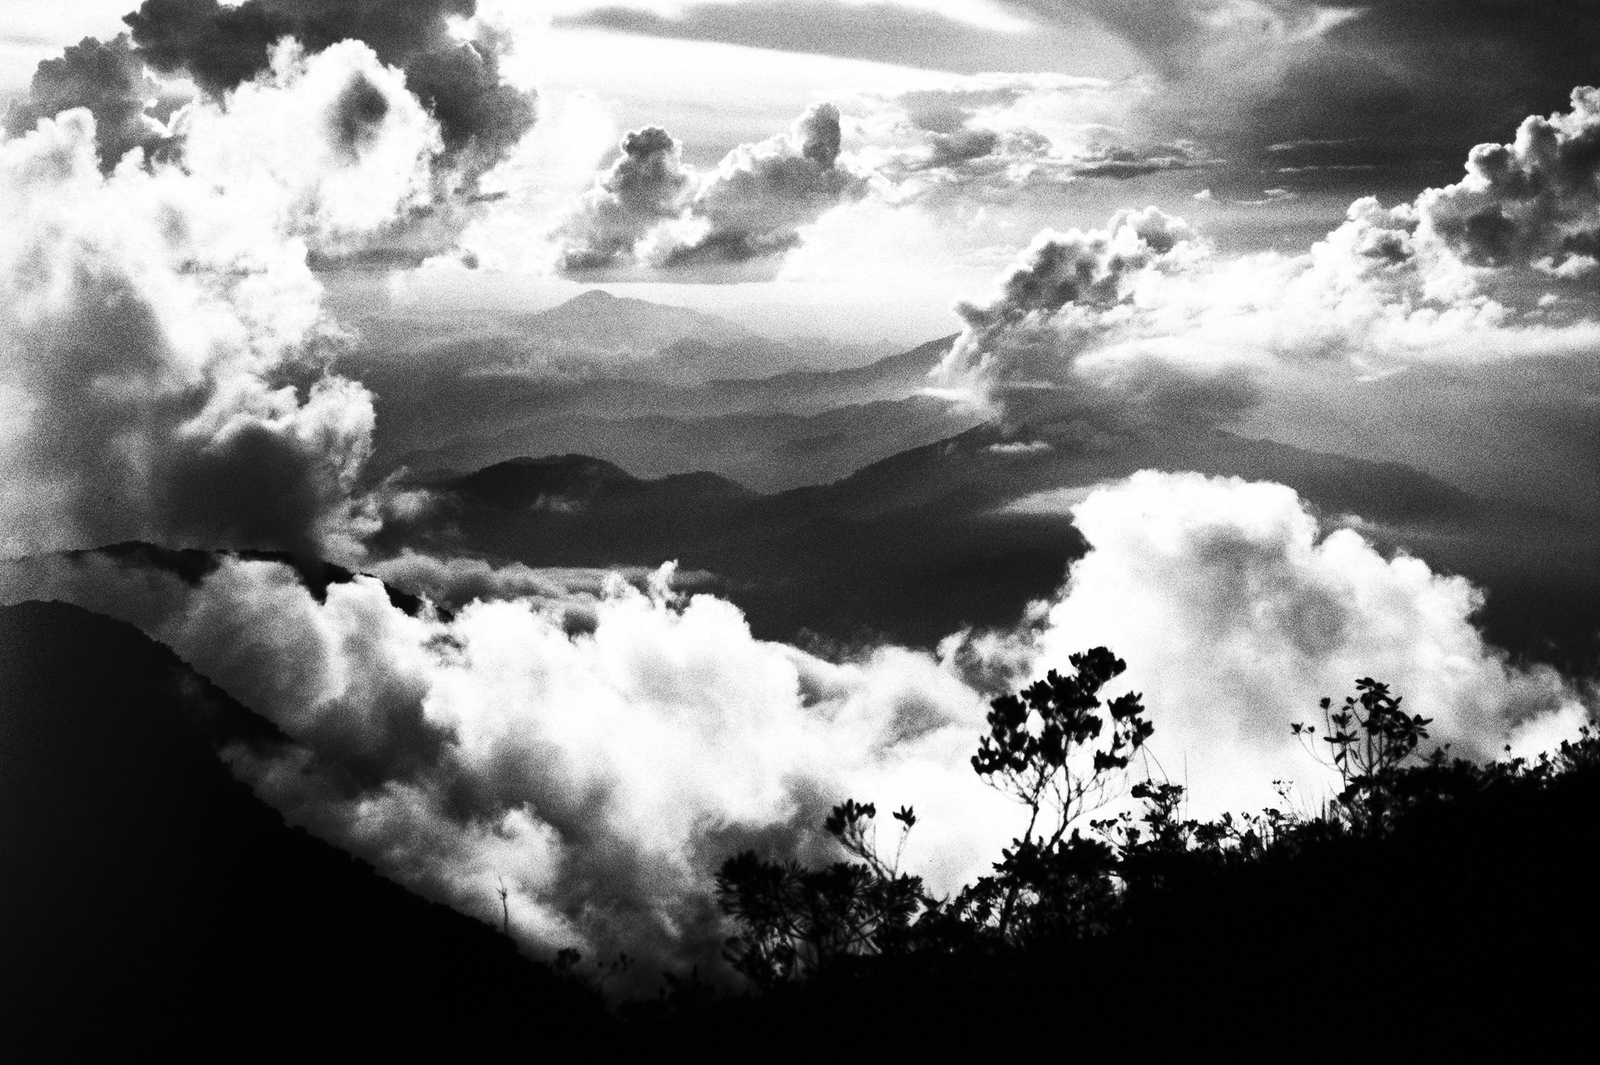 Gunung Tahan mountain scenery